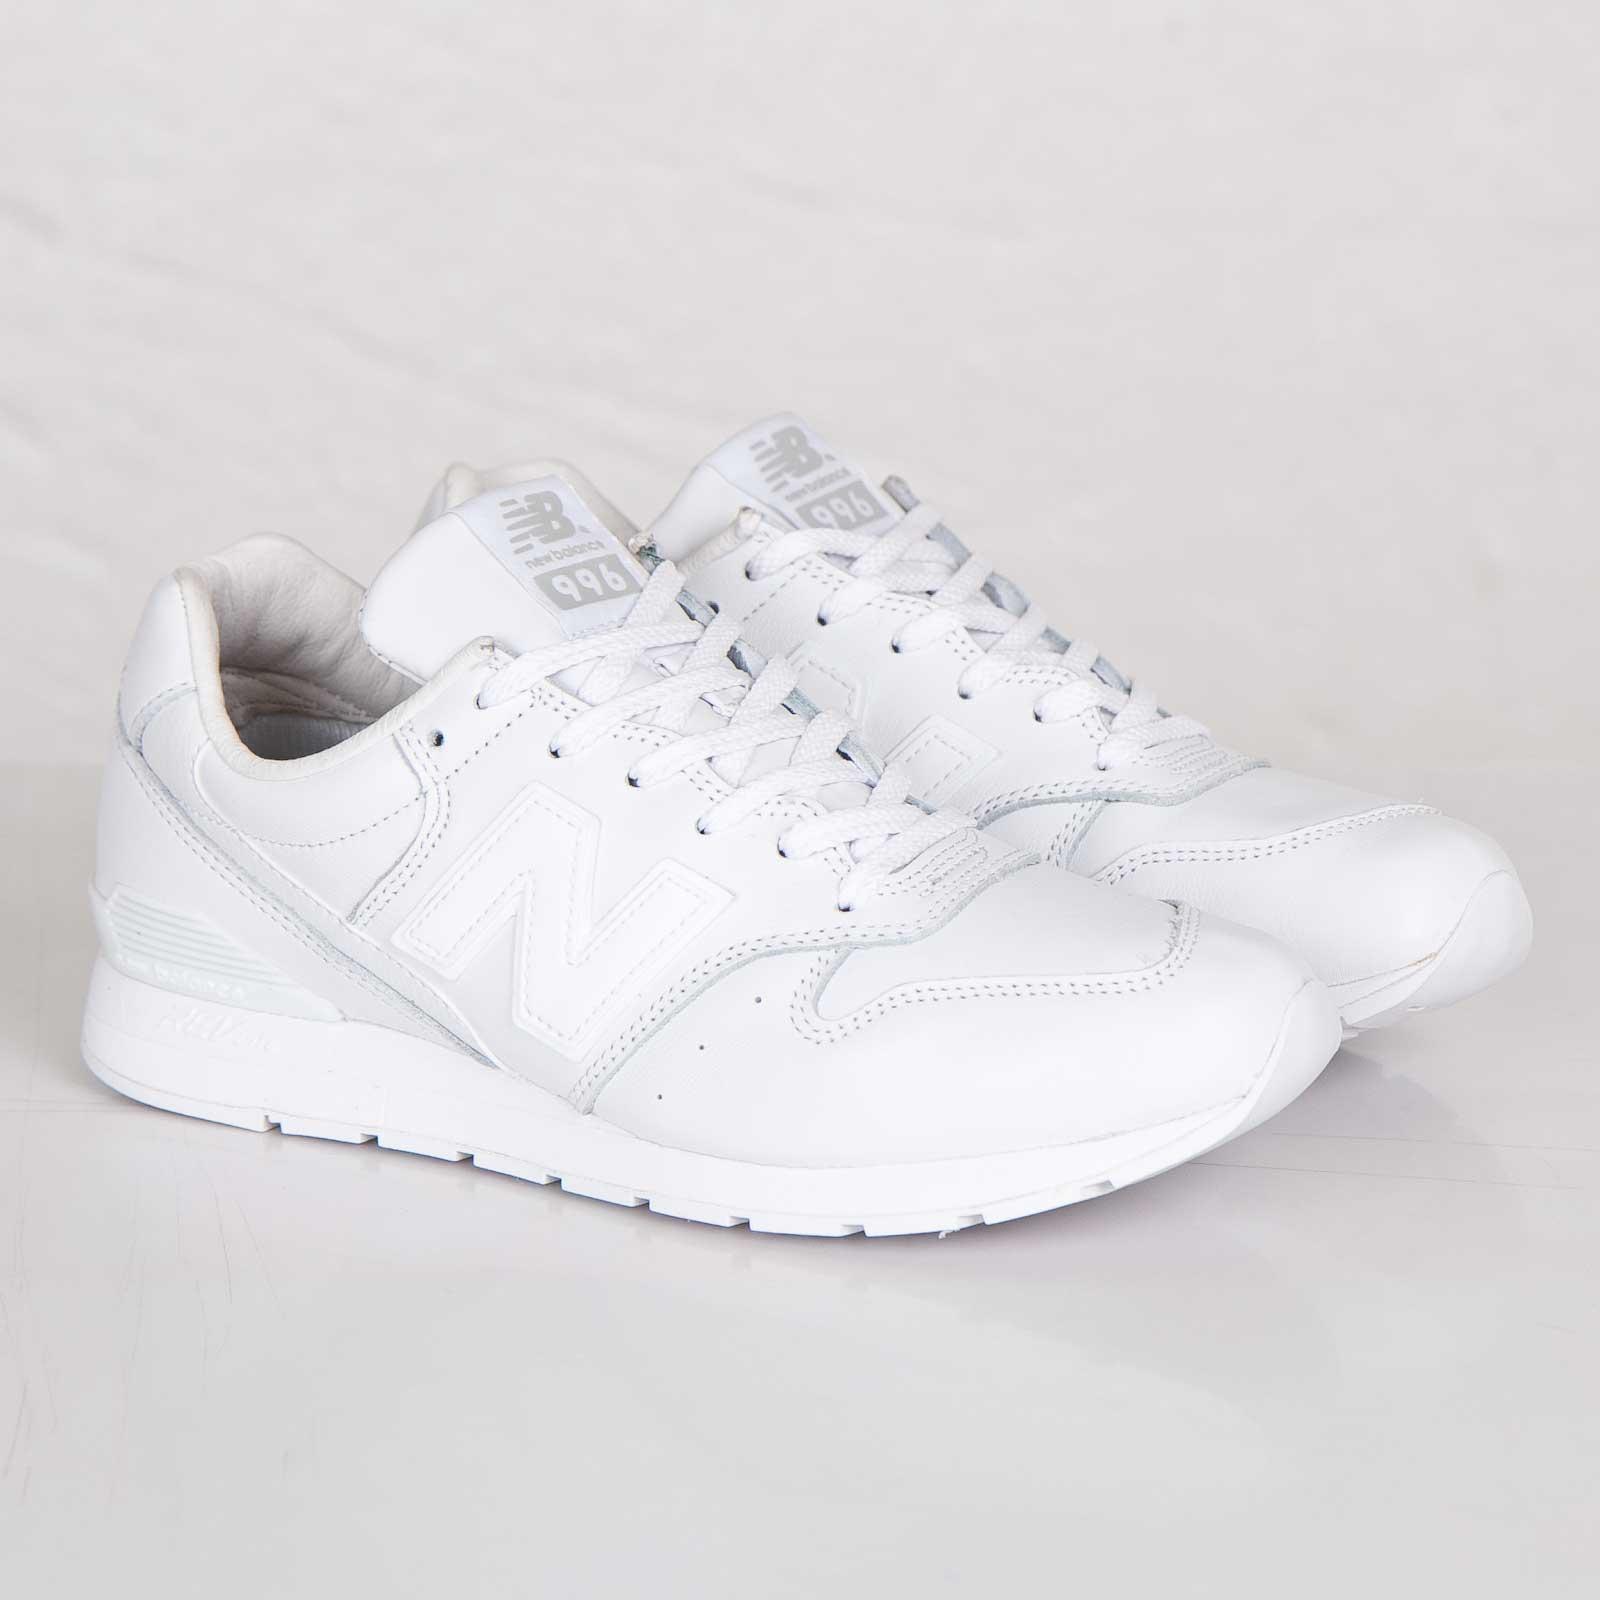 timeless design 0169c c4ddc New Balance MRL996EW - Mrl996ew - Sneakersnstuff | sneakers ...